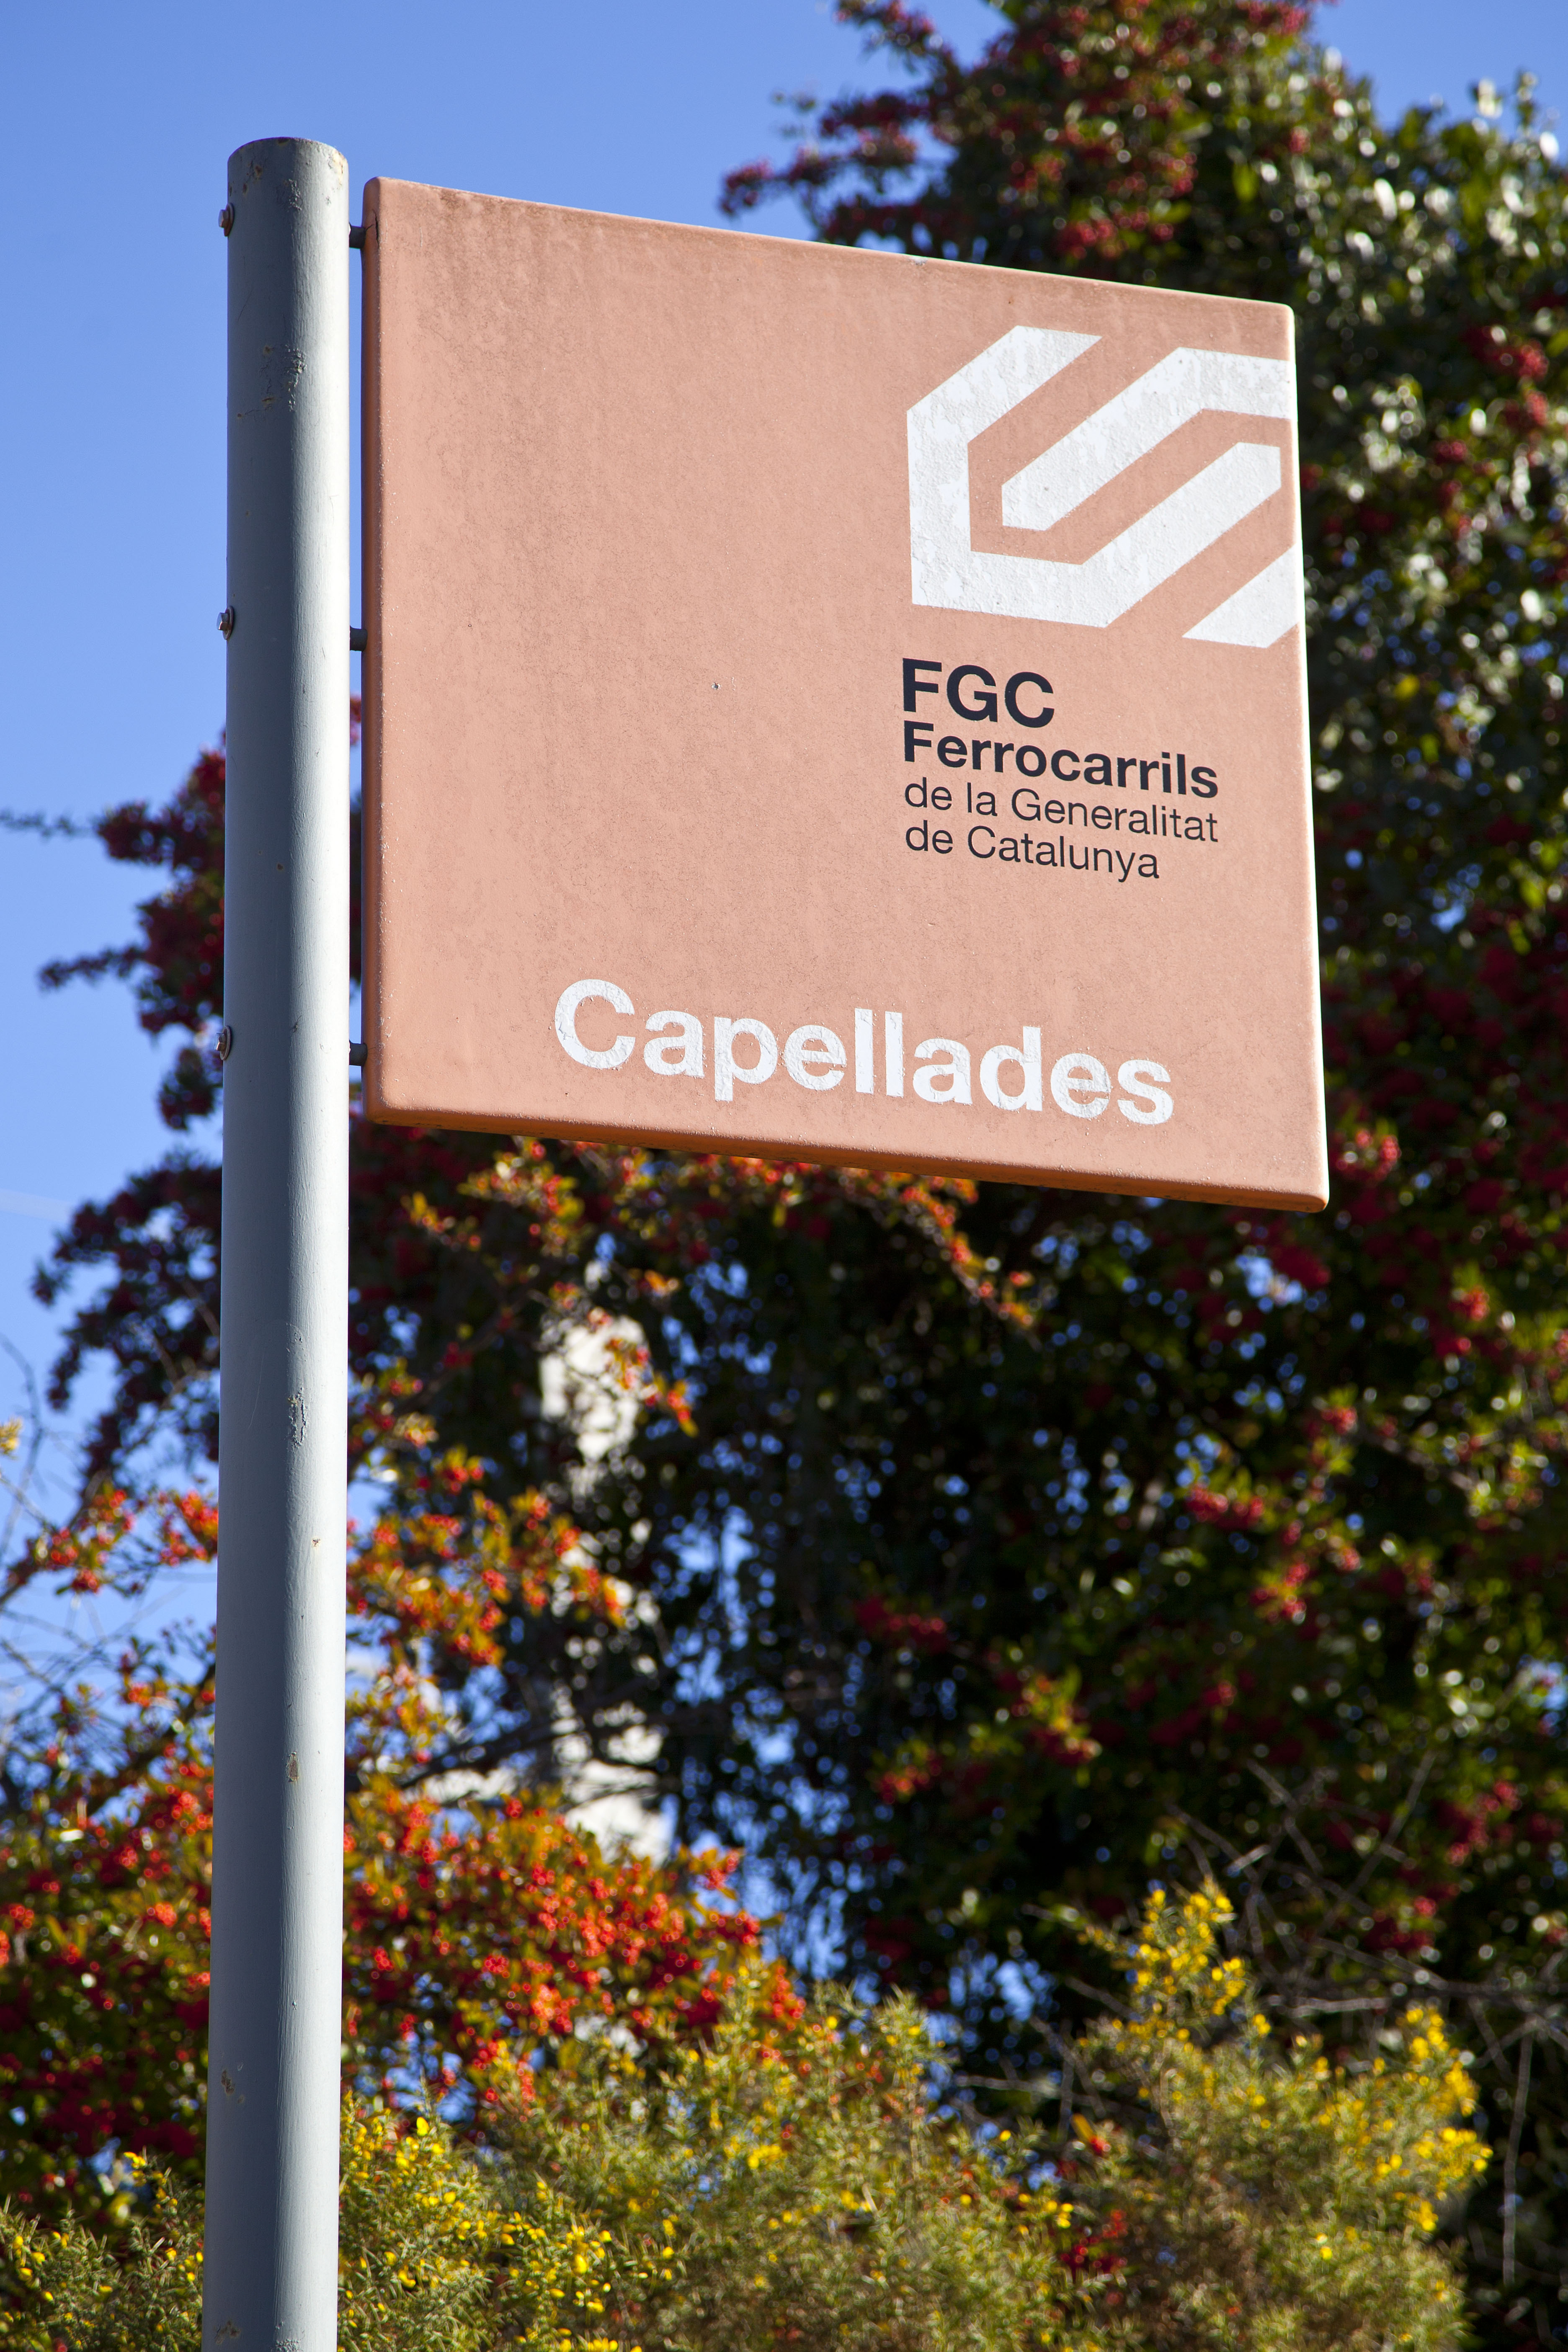 CAPELLADES-FGC